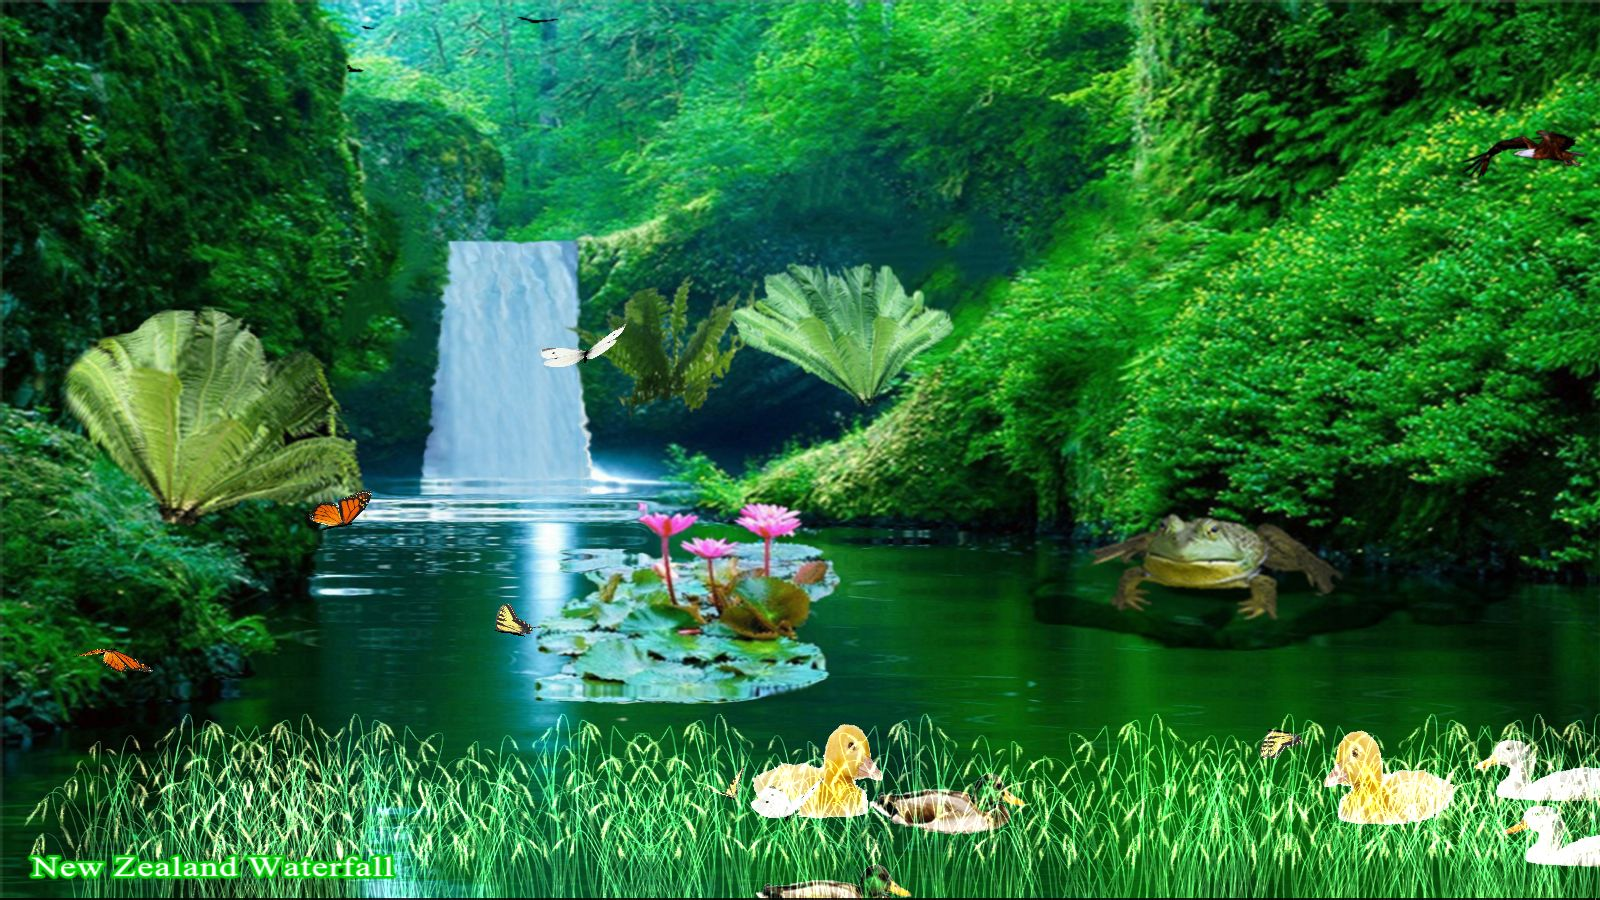 - New Zealand Waterfall Screen Saver [Download]